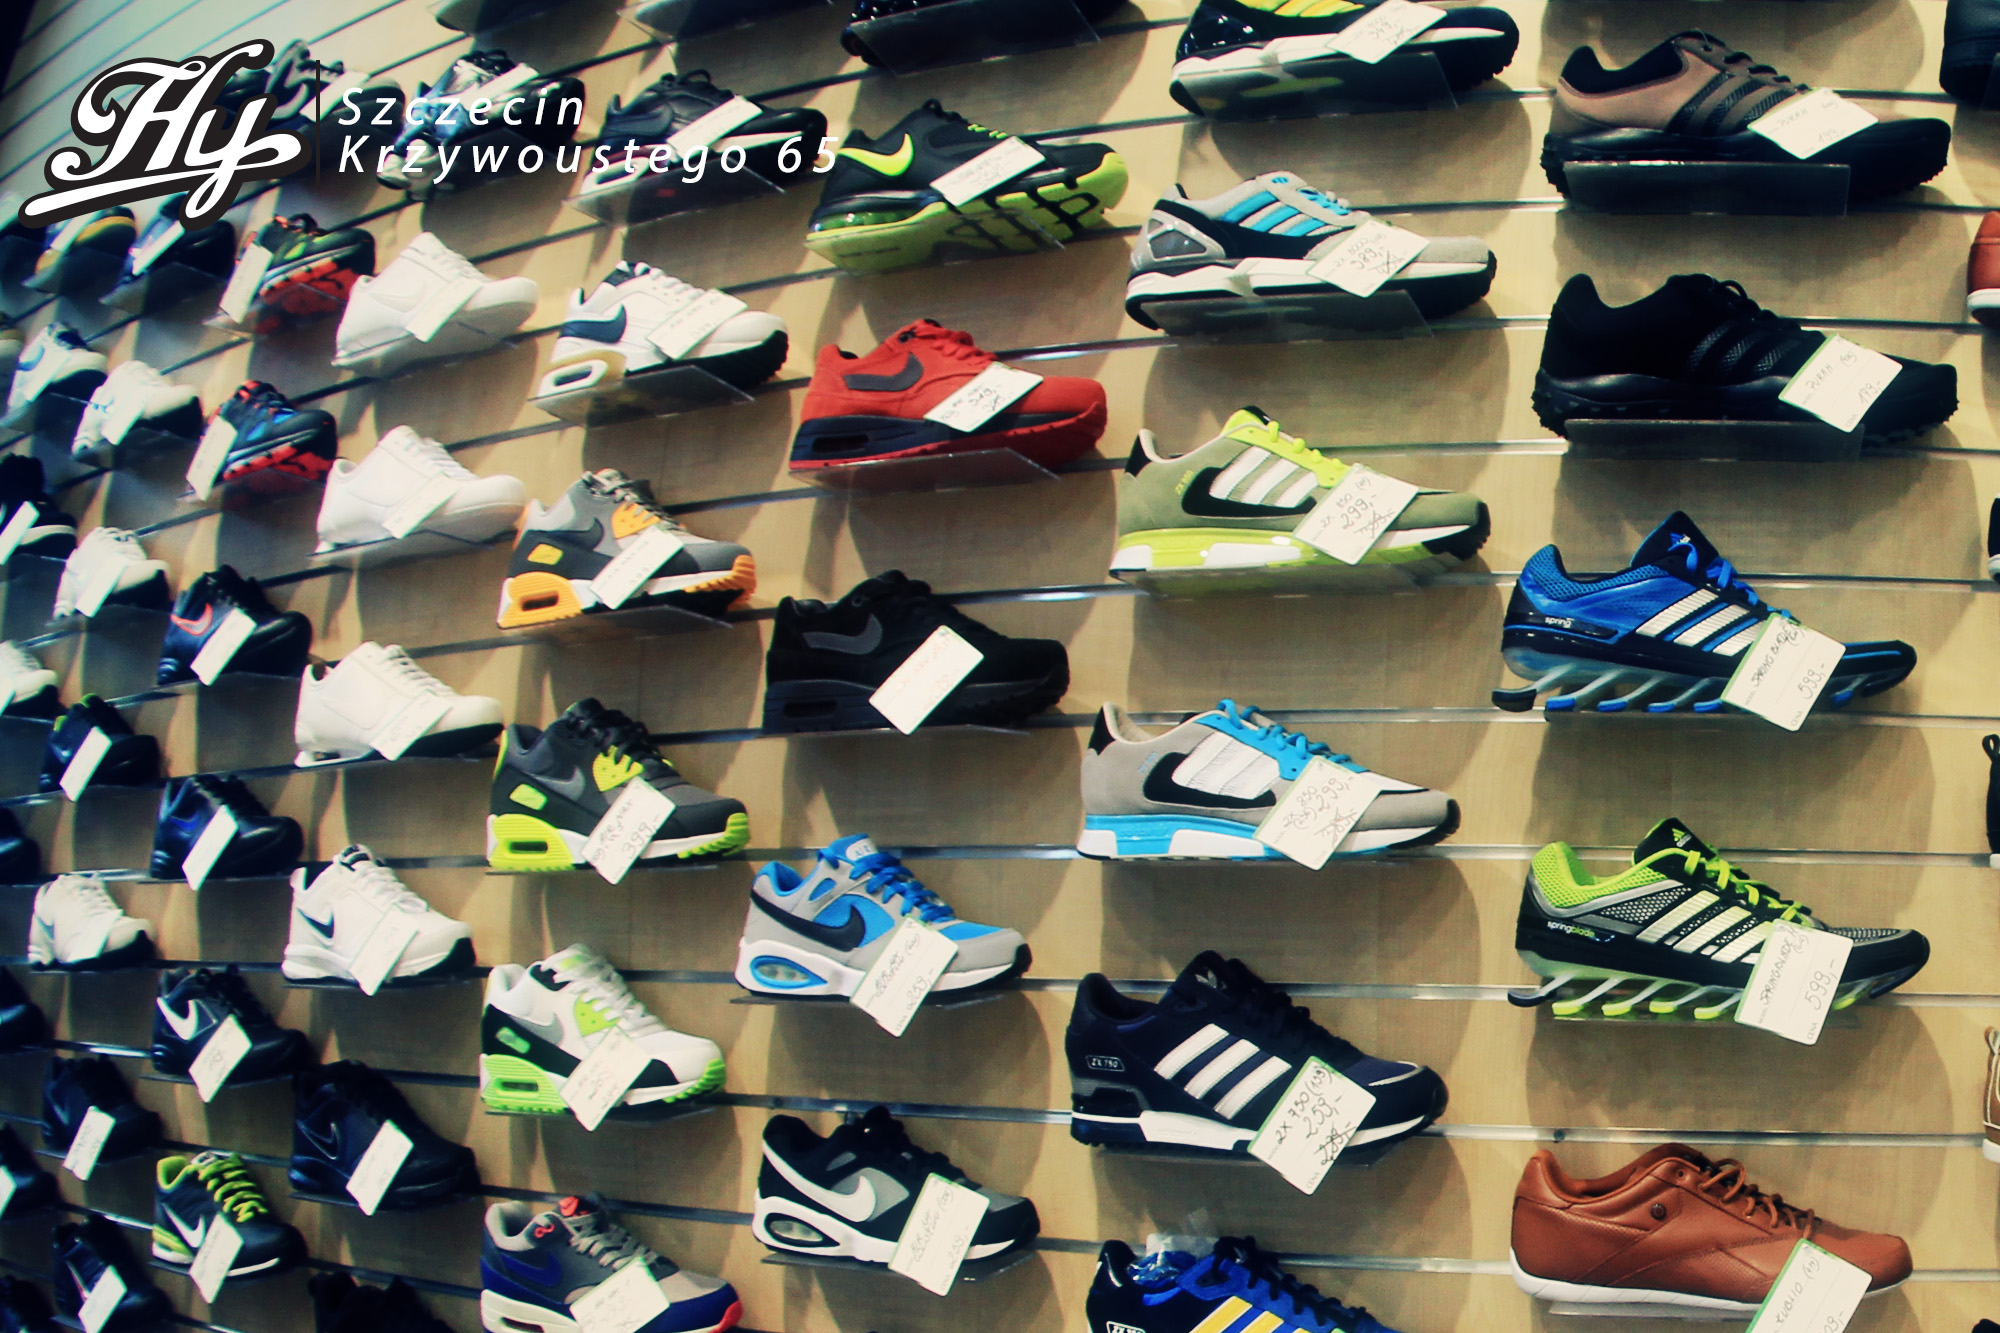 Tanie buty sportowe - Nike, Puma, Reebok, Converse